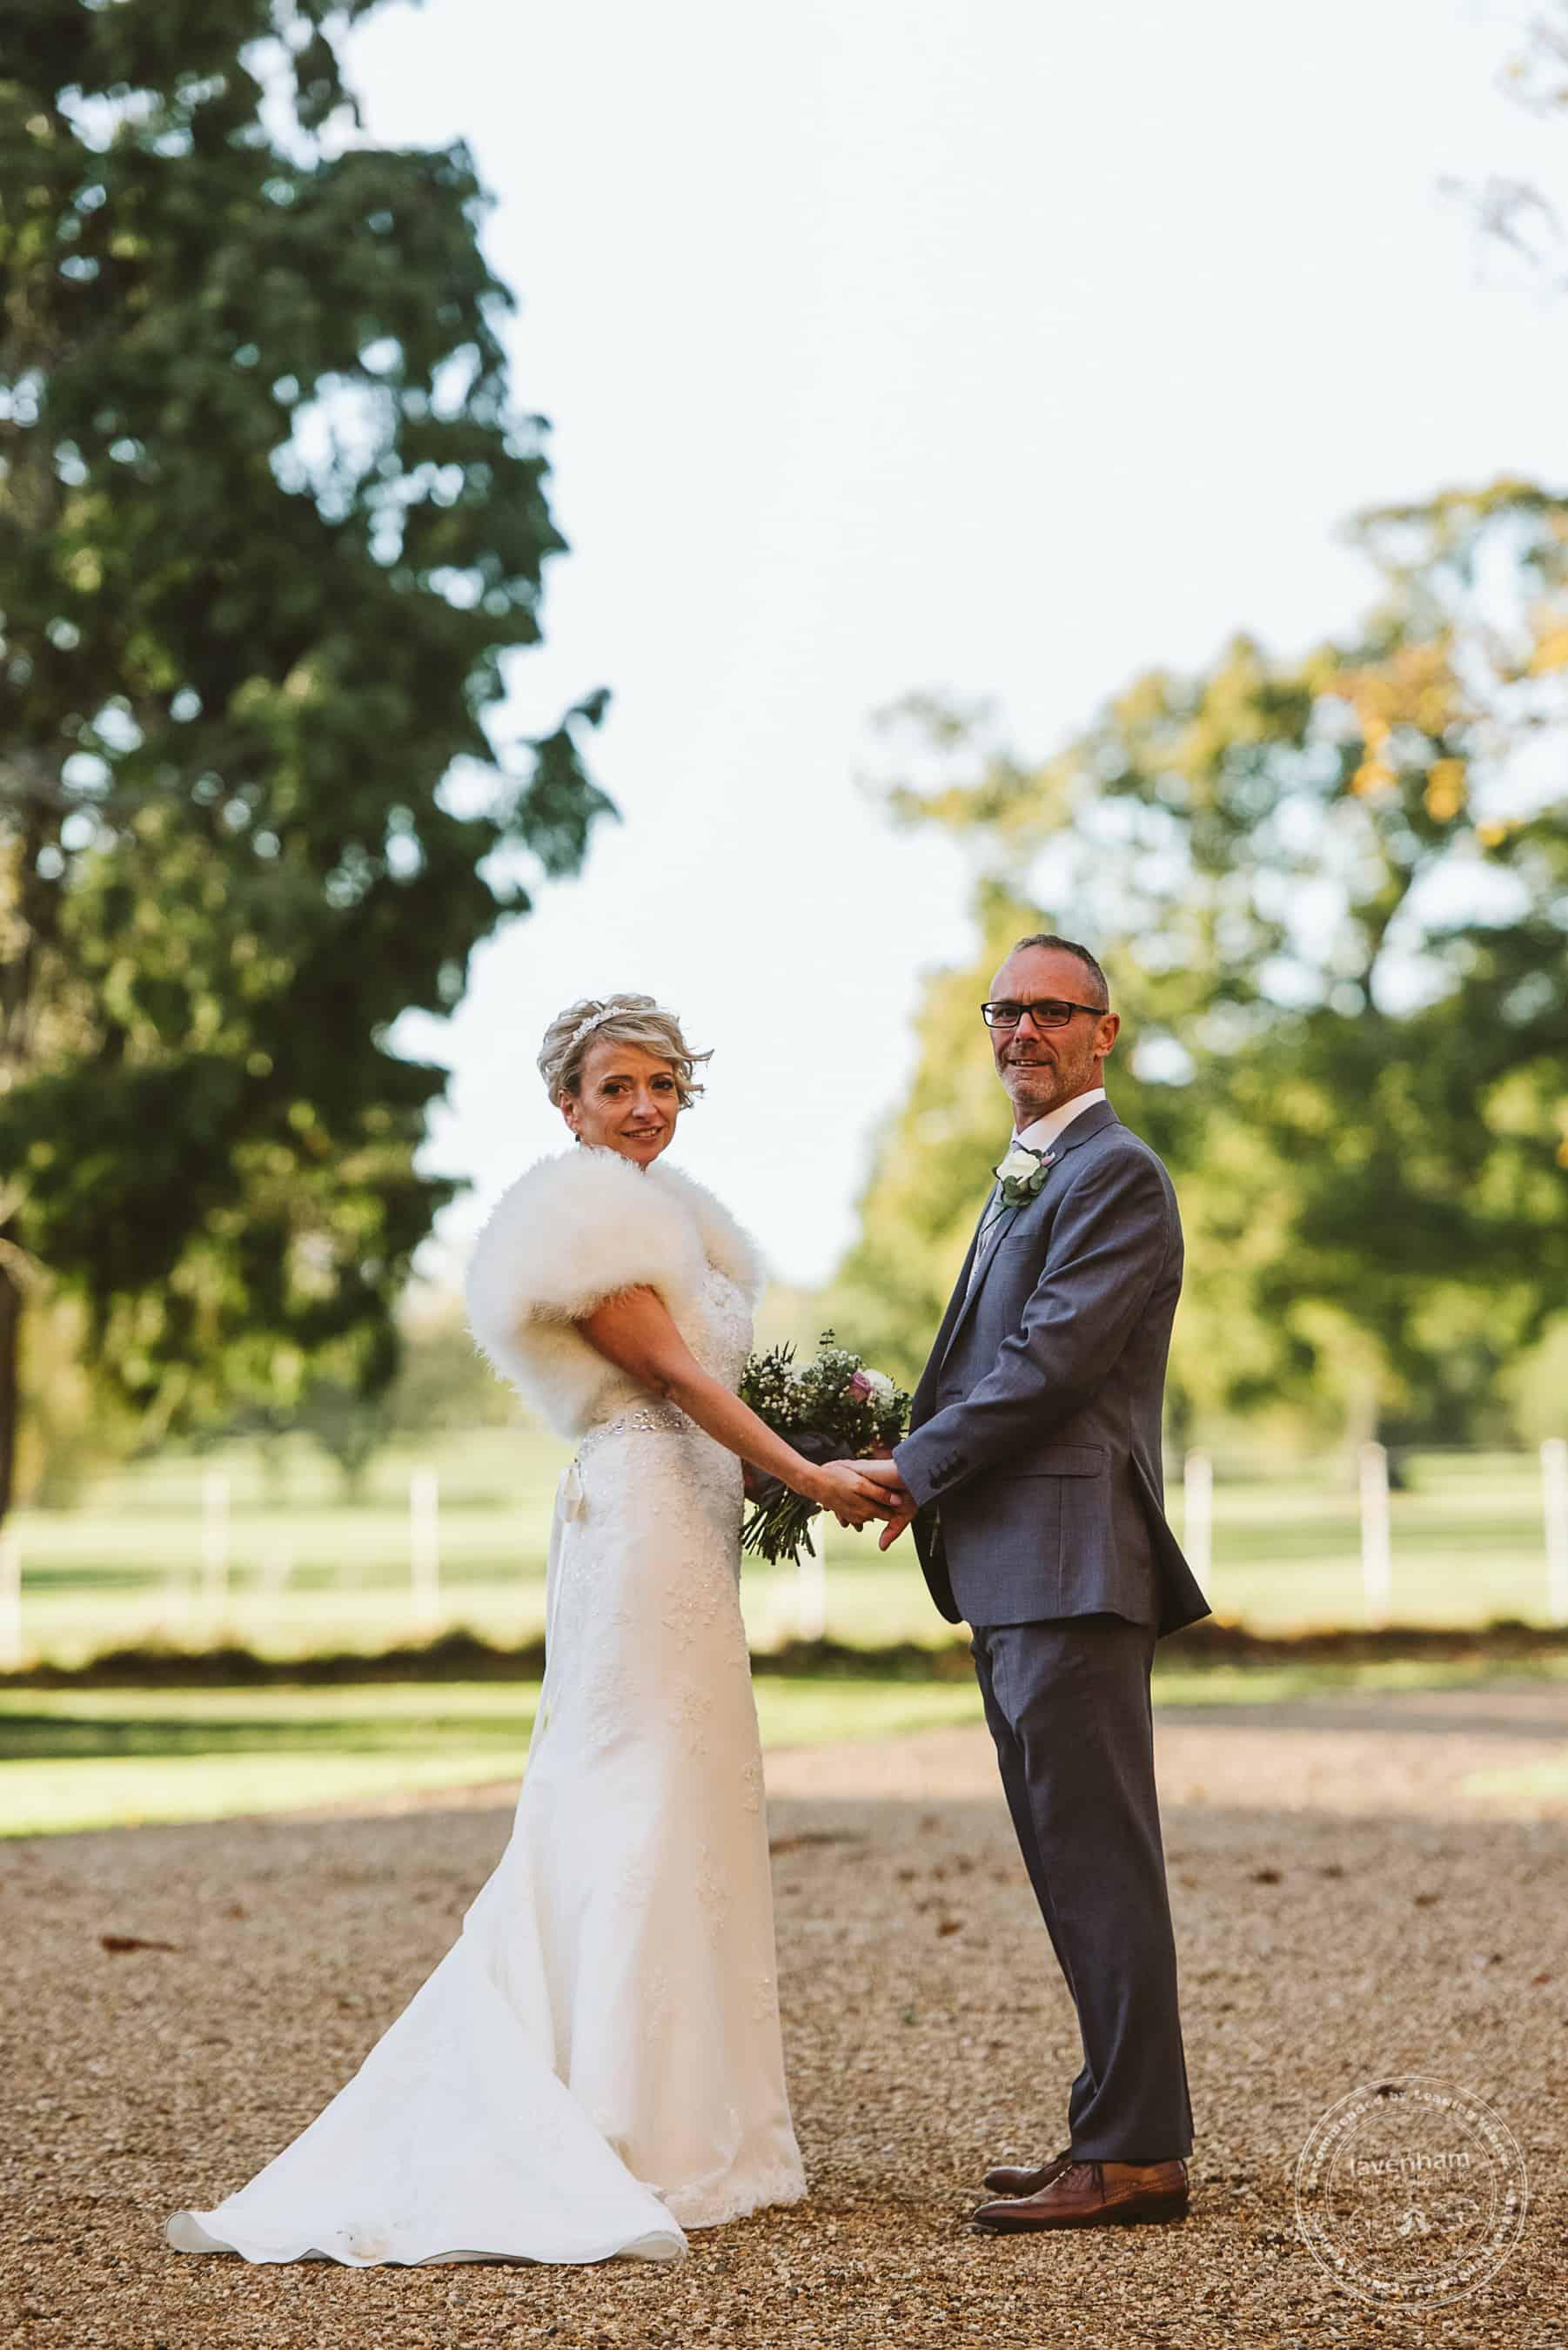 281018 Gosfield Hall Wedding Photography Lavenham Photographic 081